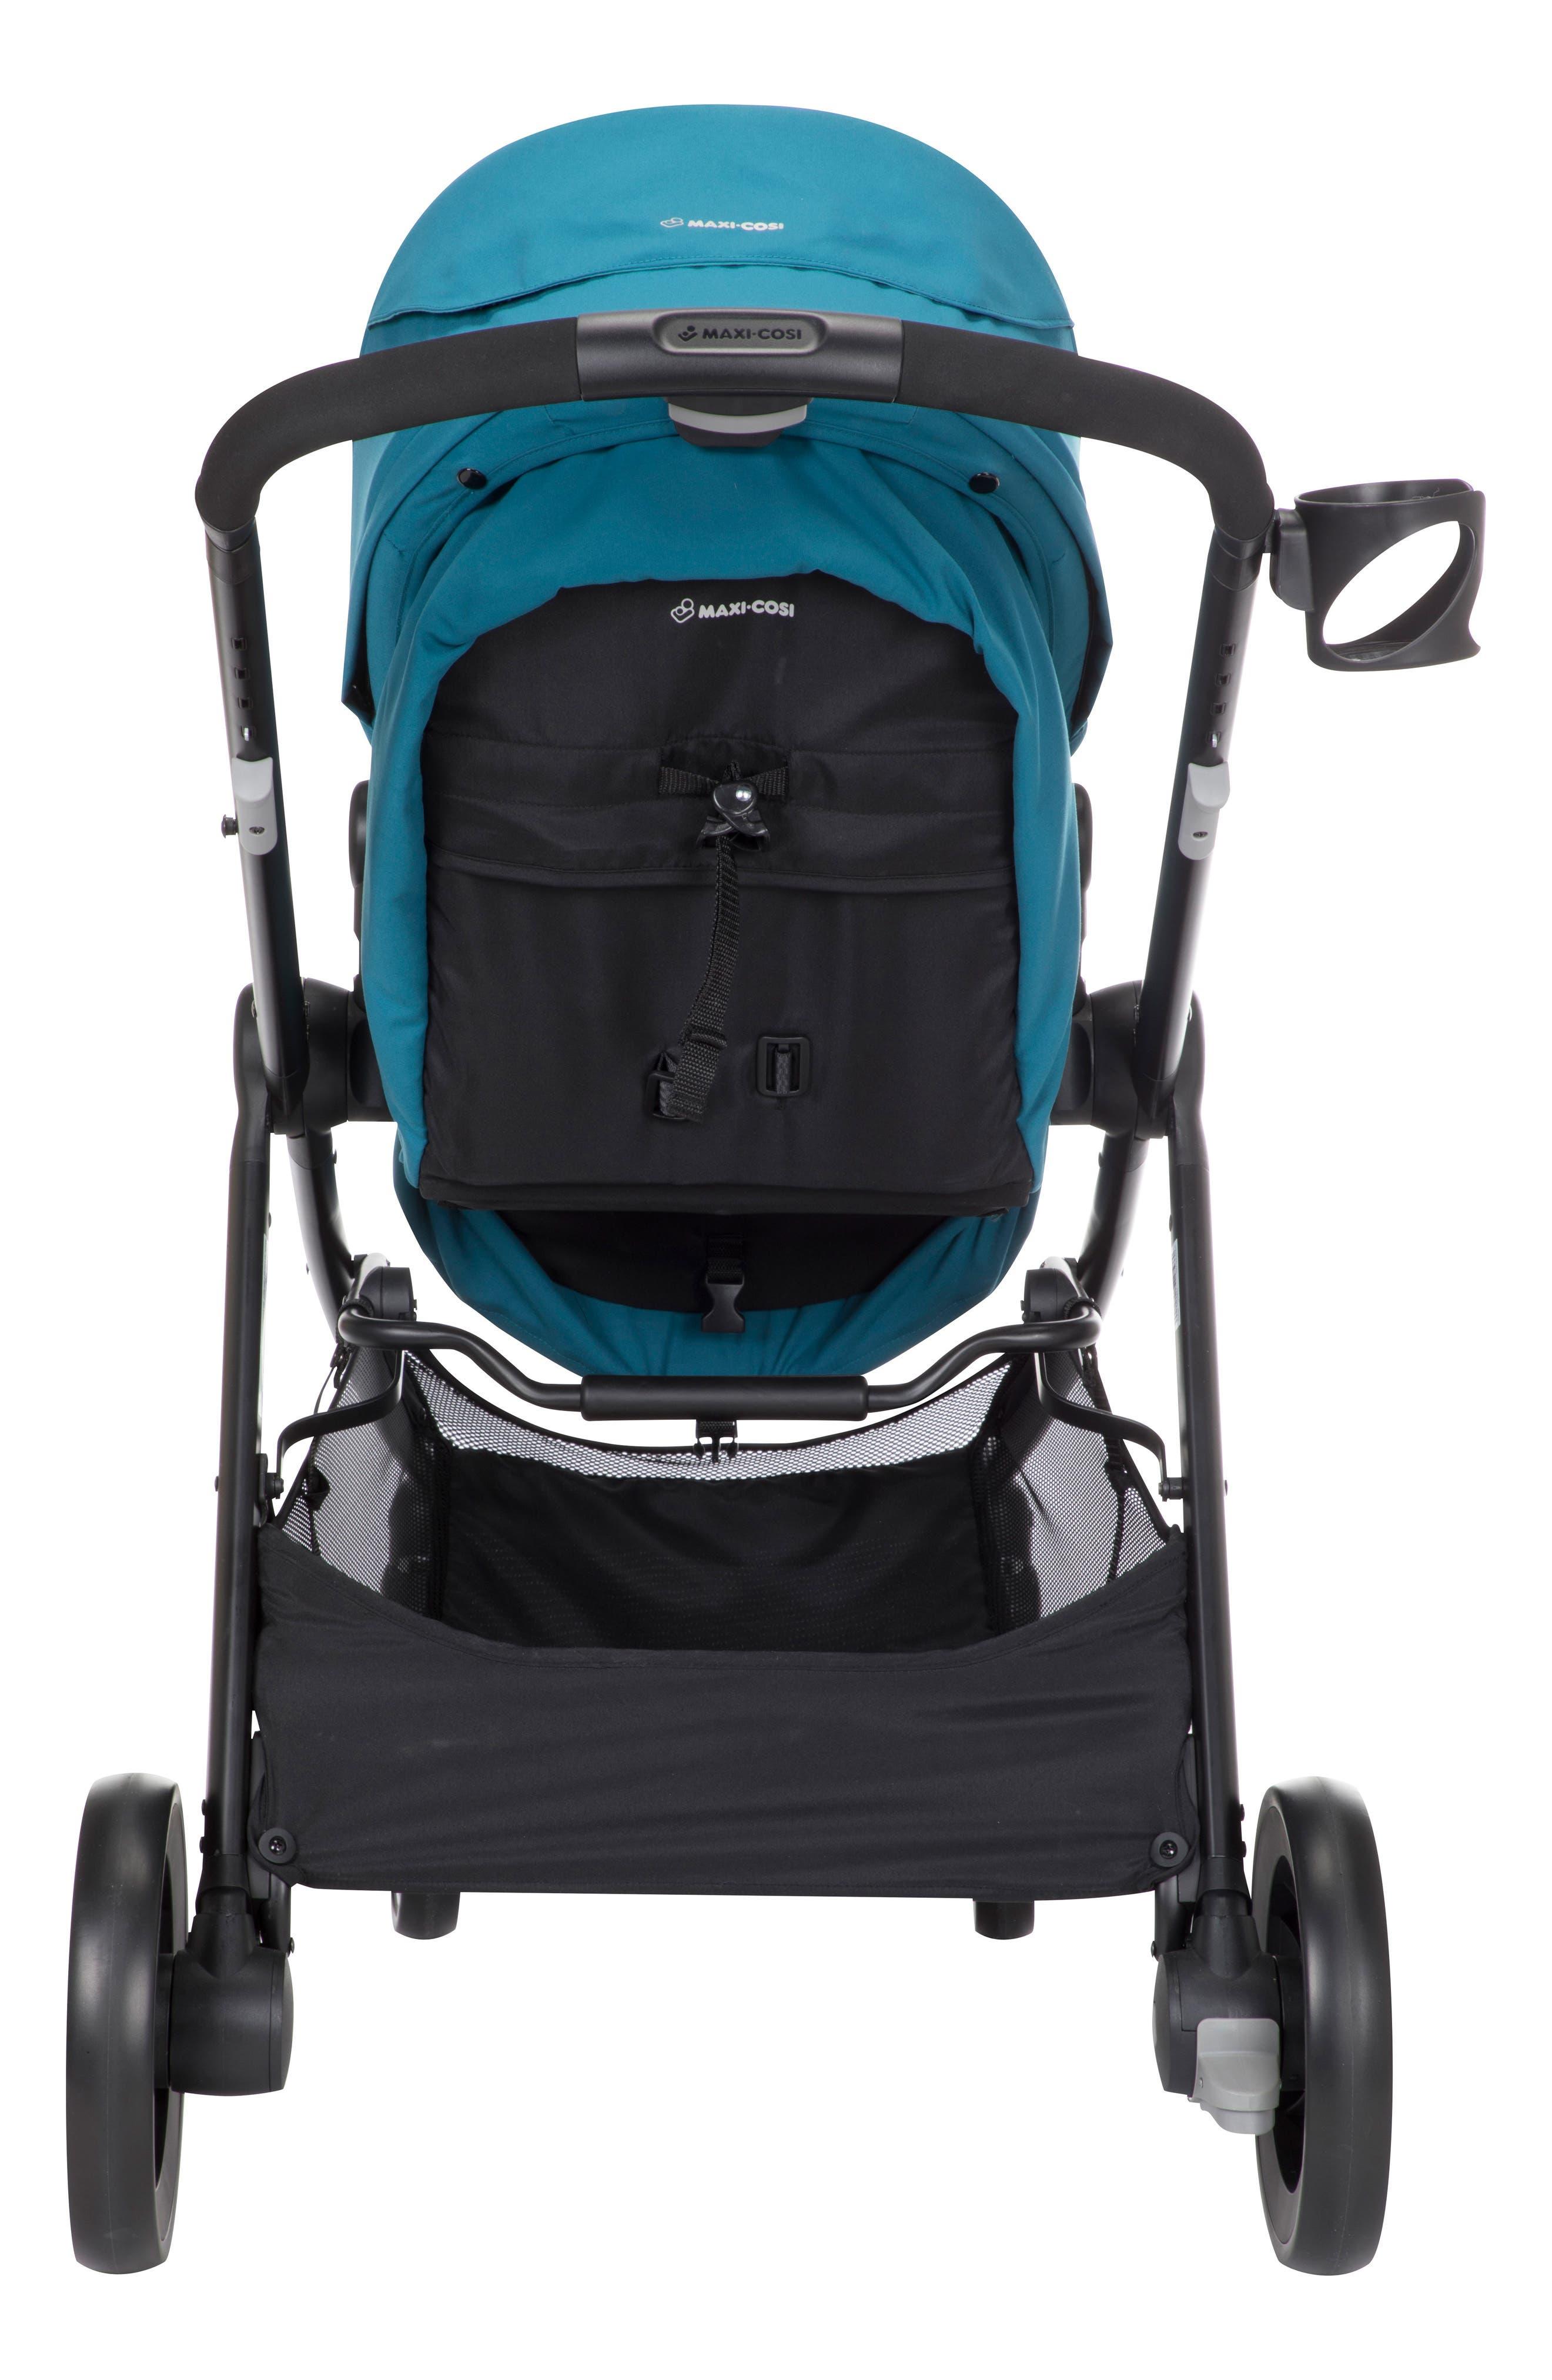 5-1 Mico 30 Infant Car Seat & Zelia Stroller Modular Travel System,                             Alternate thumbnail 12, color,                             Emerald Tide